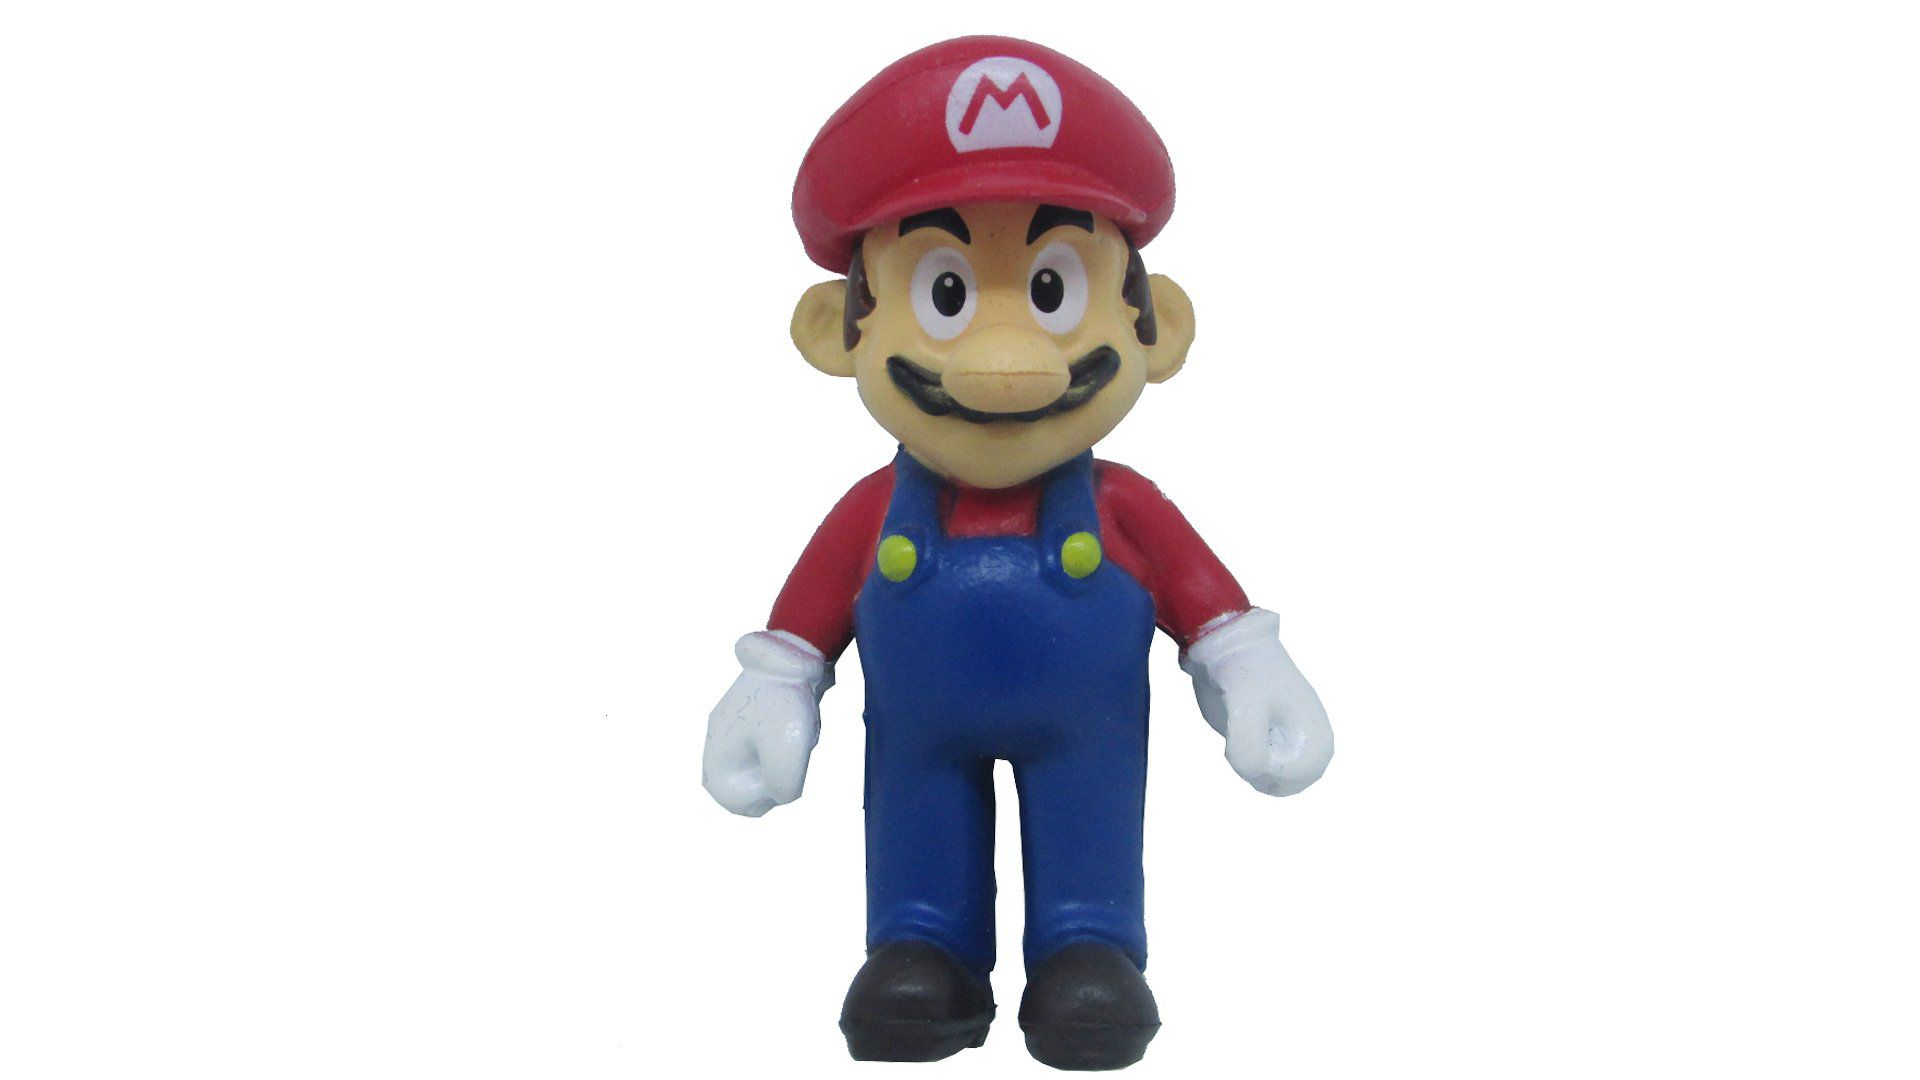 Boneco Colecionável Super Mario - Mario - 6CM